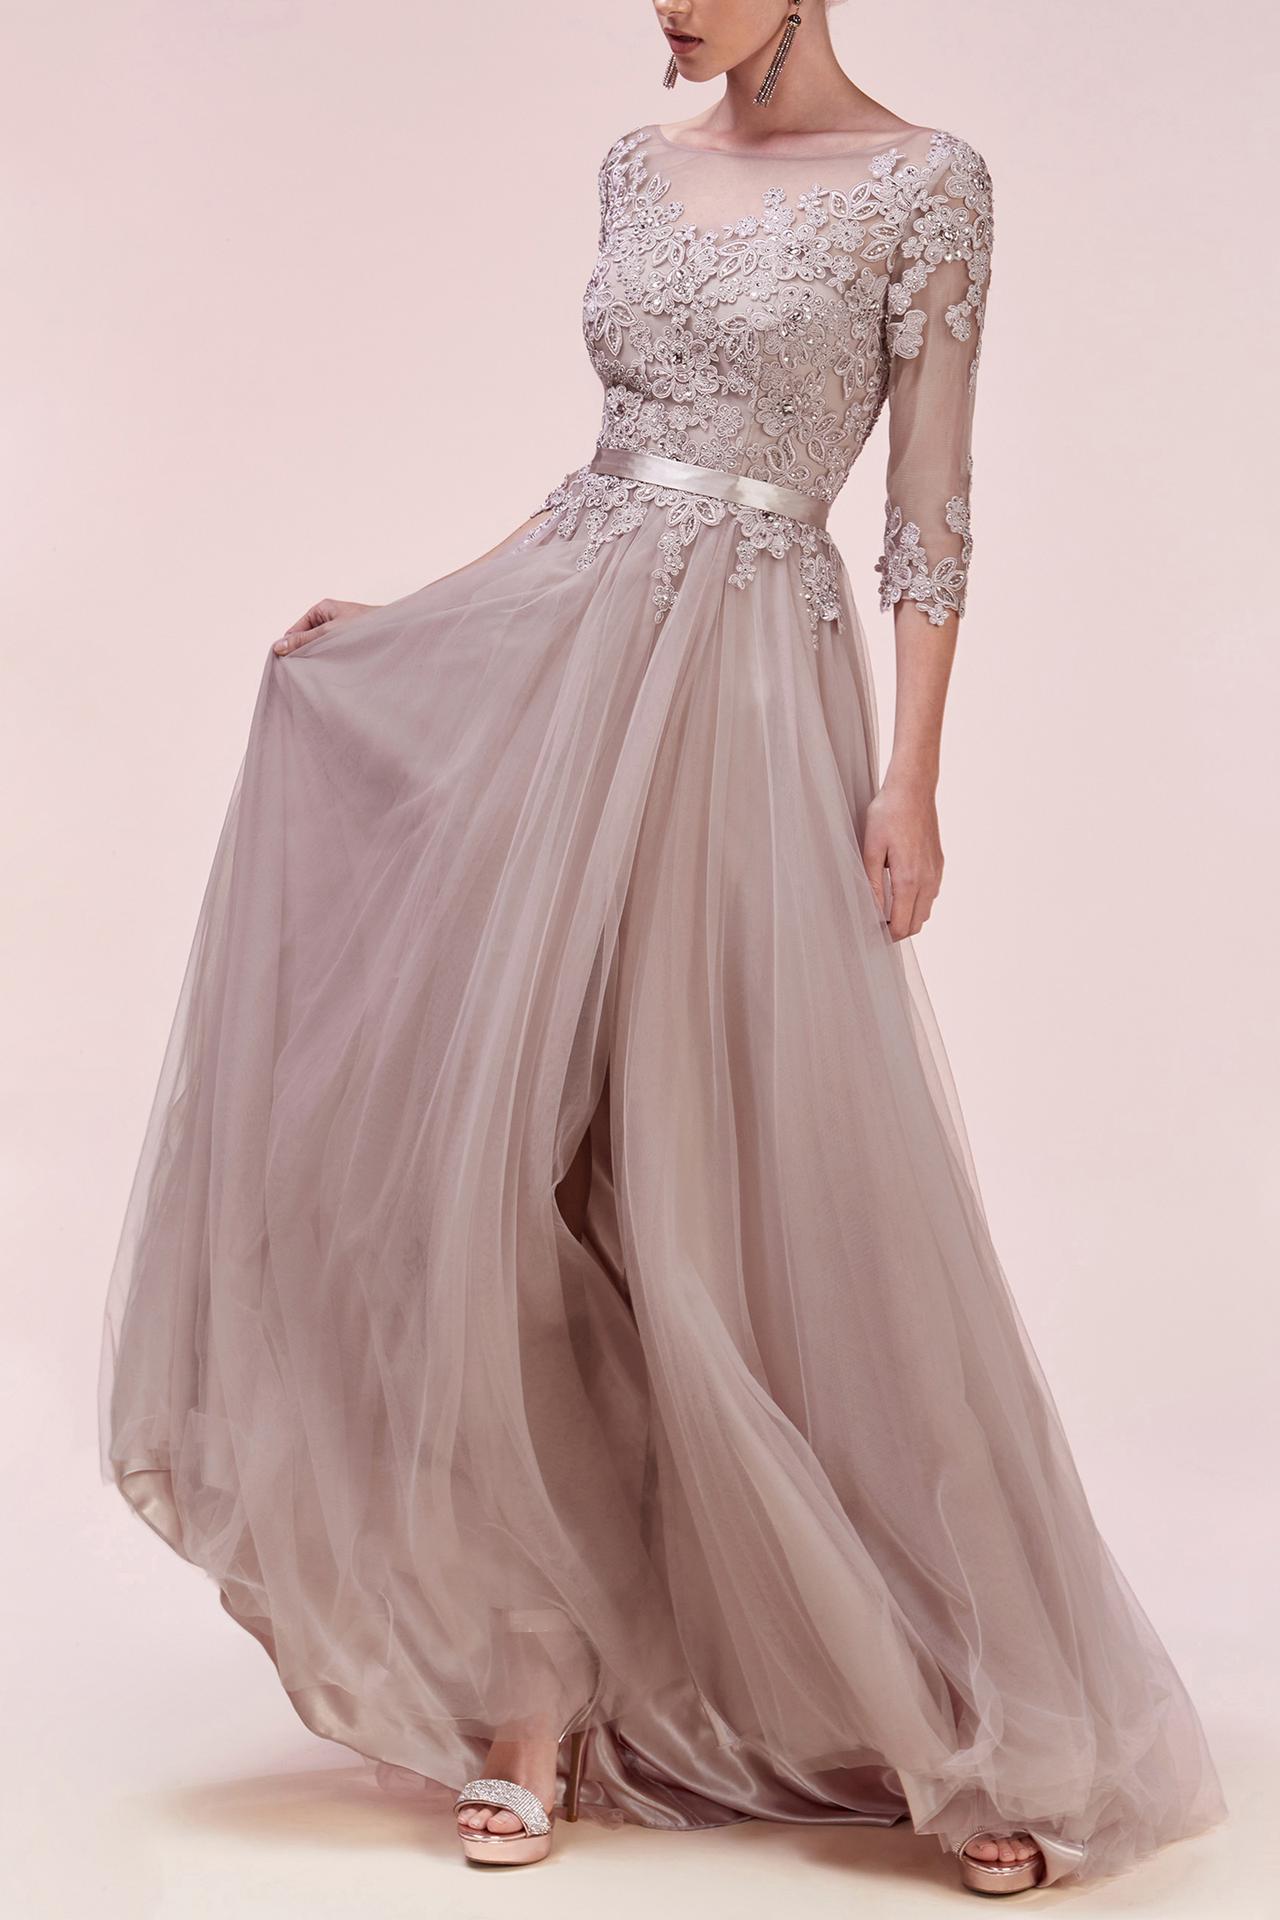 Nové spoločenské šaty :) - Obrázok č. 23